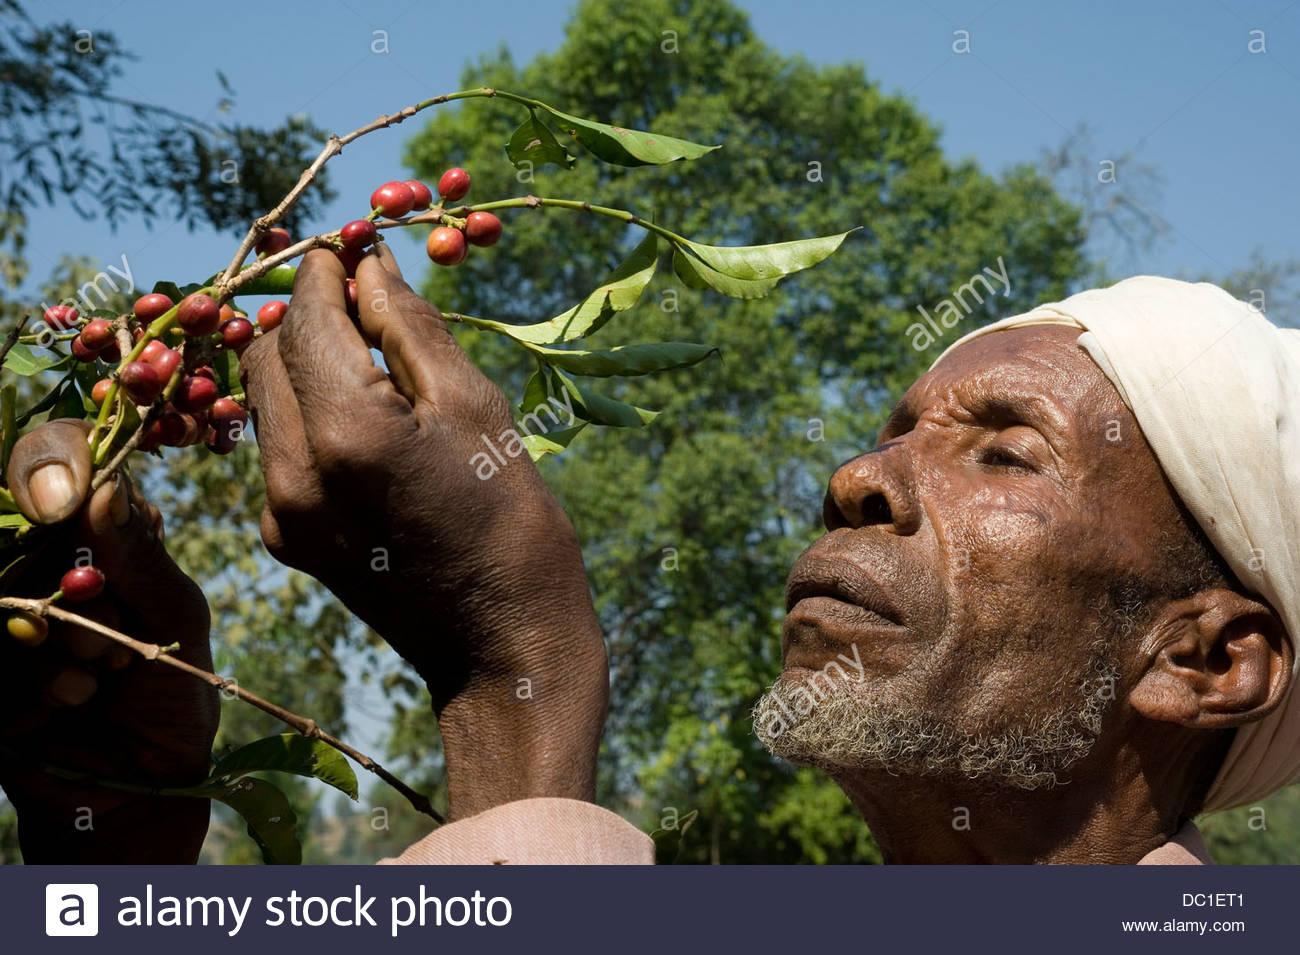 Ethiopia, District: Limu Seku, Zone: Jimma, Village: Dego Galcha. 9 January  2010: Picking the coffee cherry.